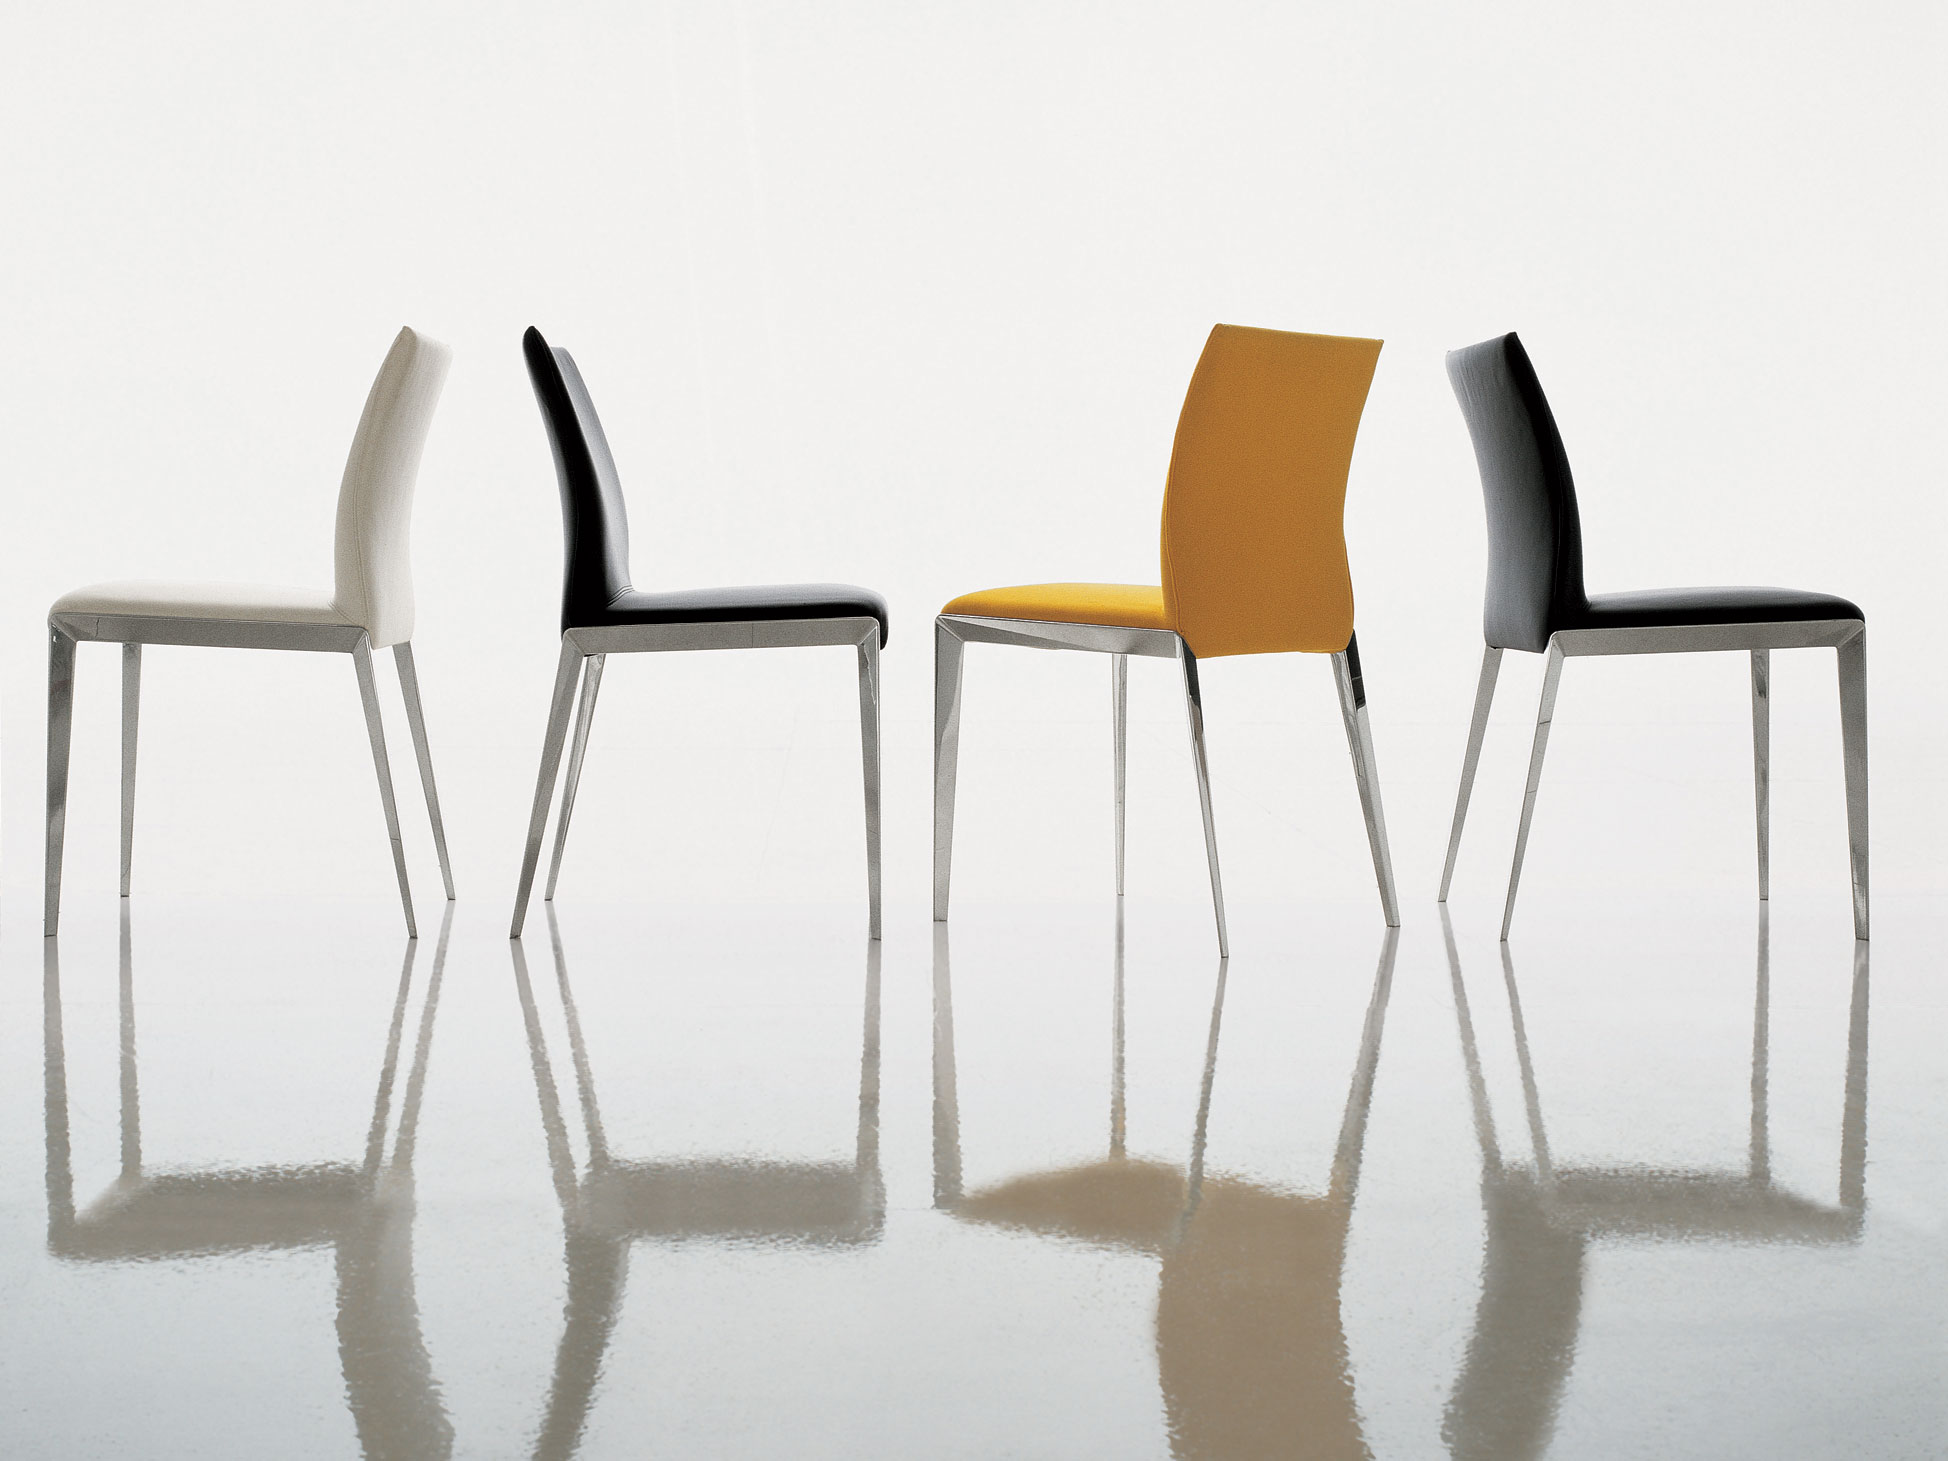 chaise rembourr e en tissu avec rev tement amovible dart by molteni c design hannes wettstein. Black Bedroom Furniture Sets. Home Design Ideas